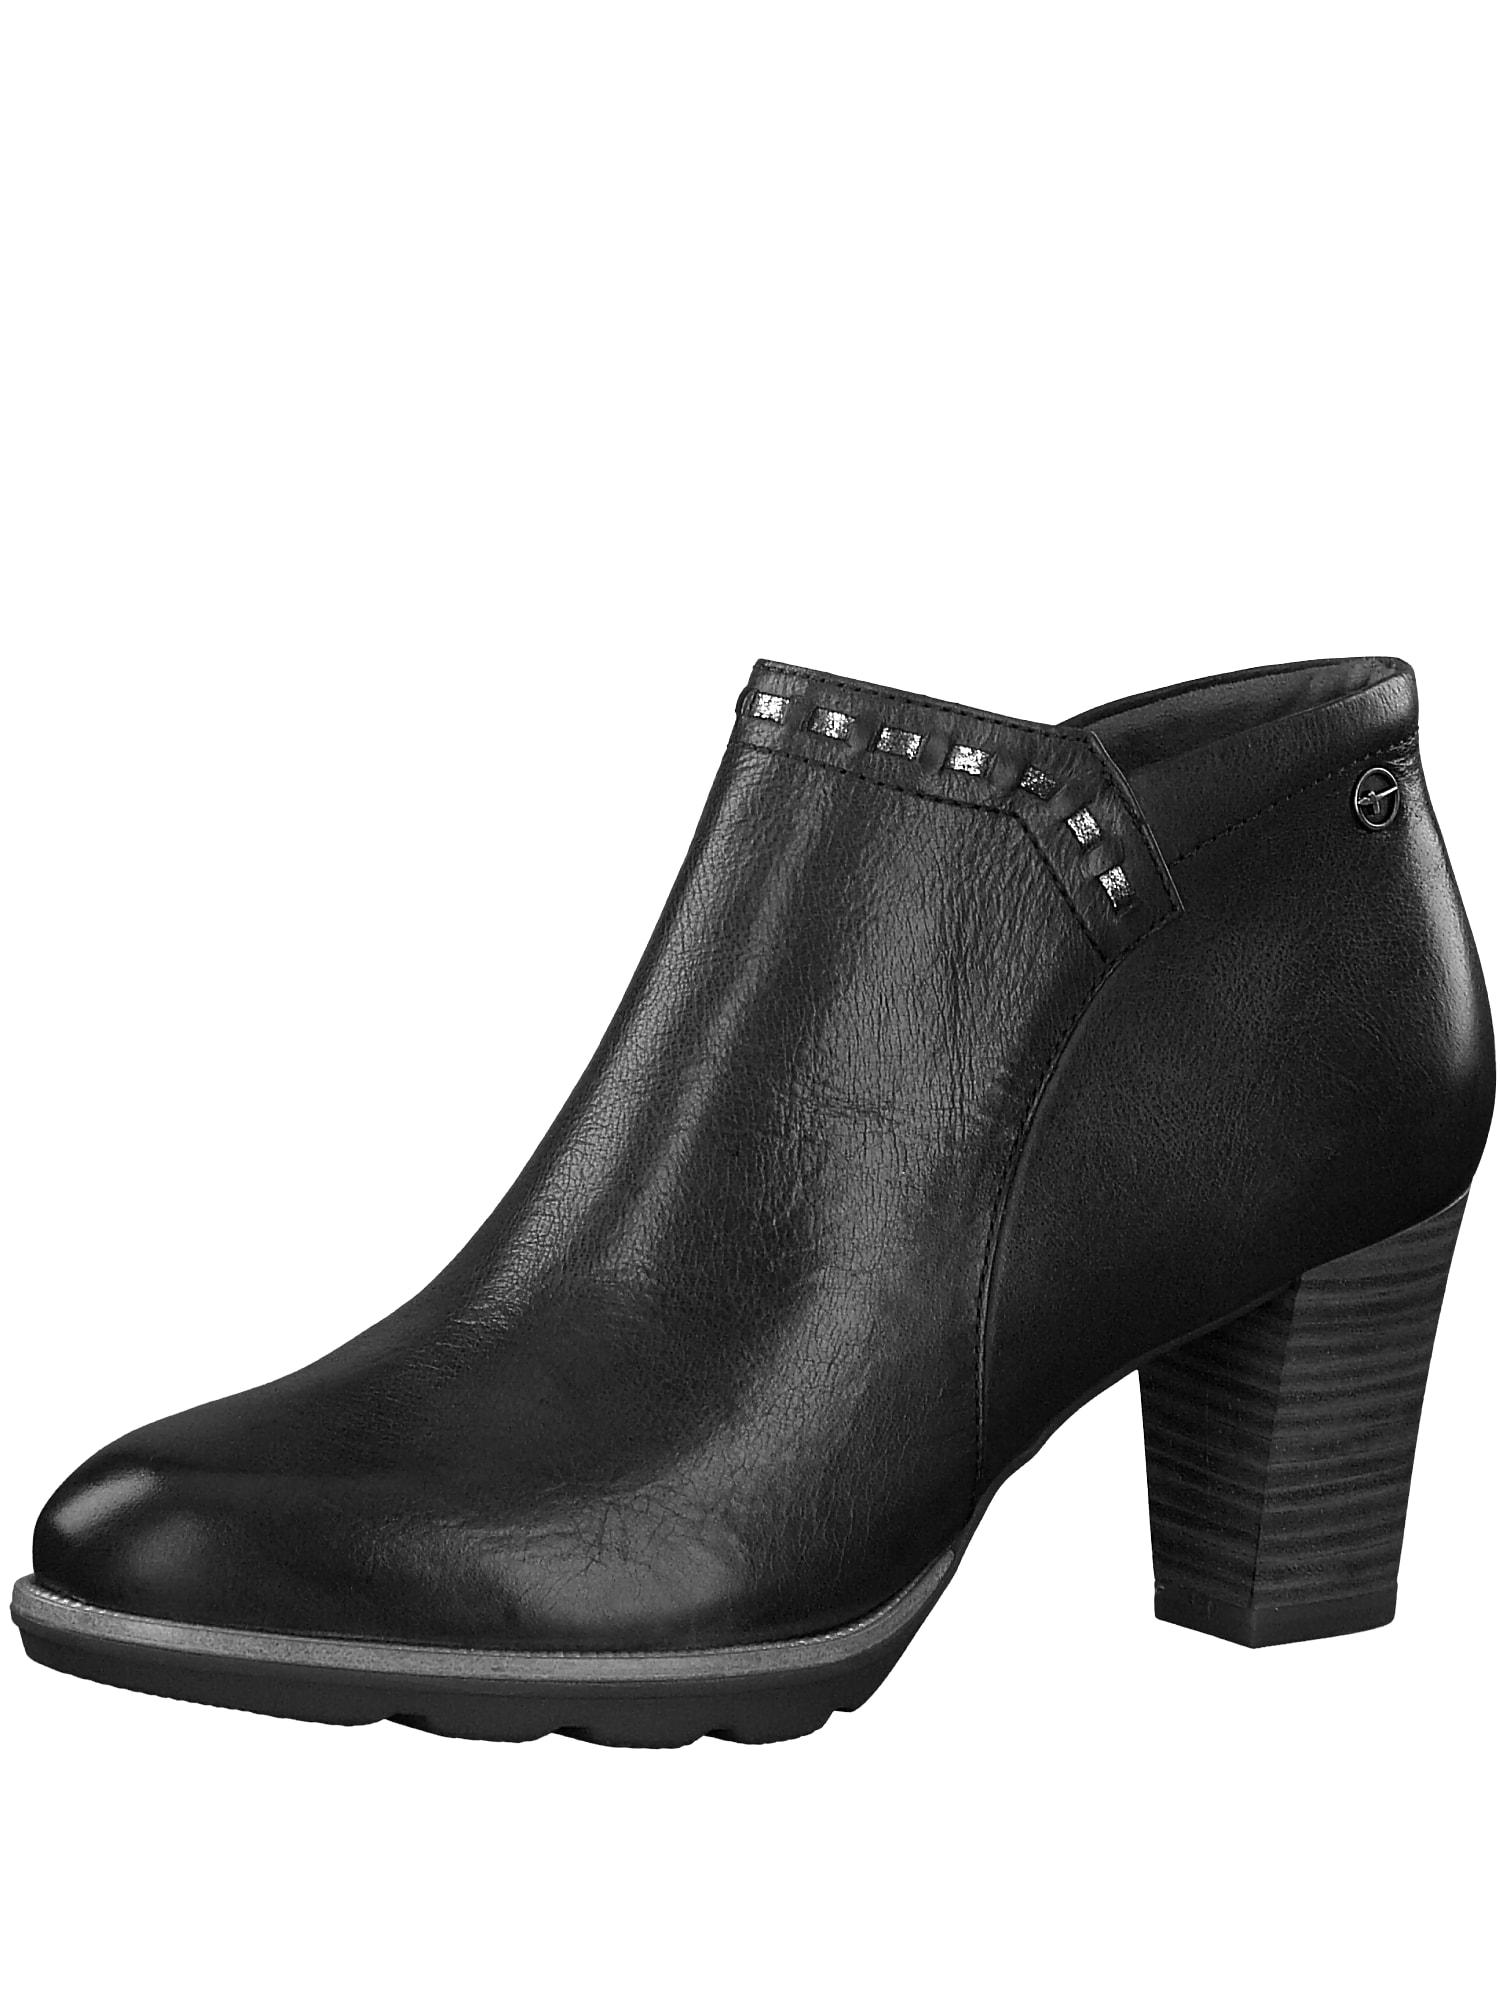 Kotníkové boty Fee černá TAMARIS